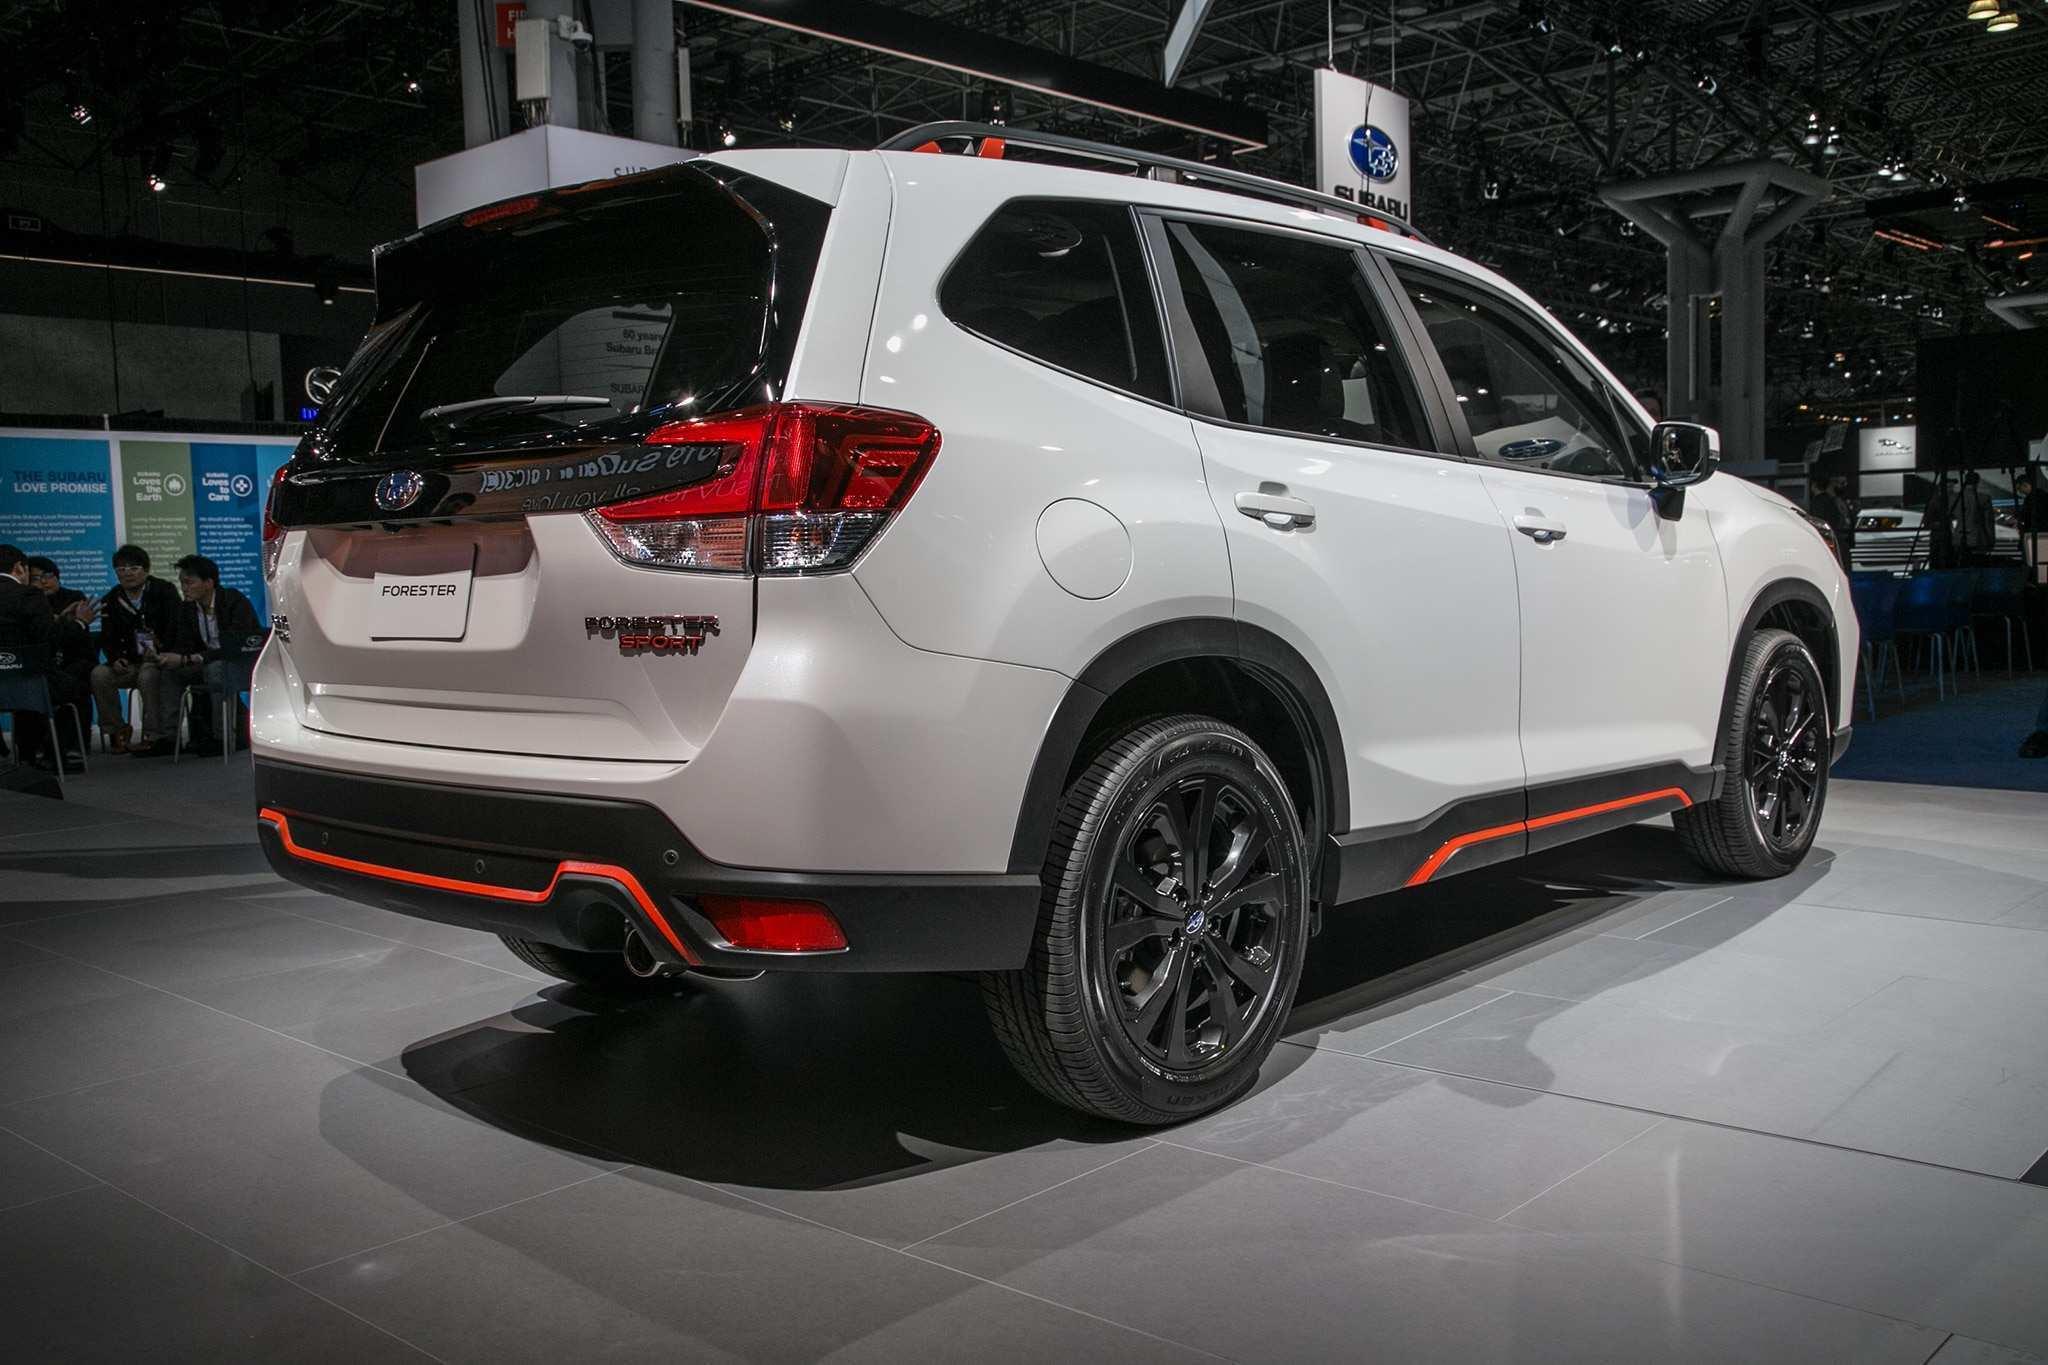 64 Best Review 2019 Subaru Updates Model by 2019 Subaru Updates